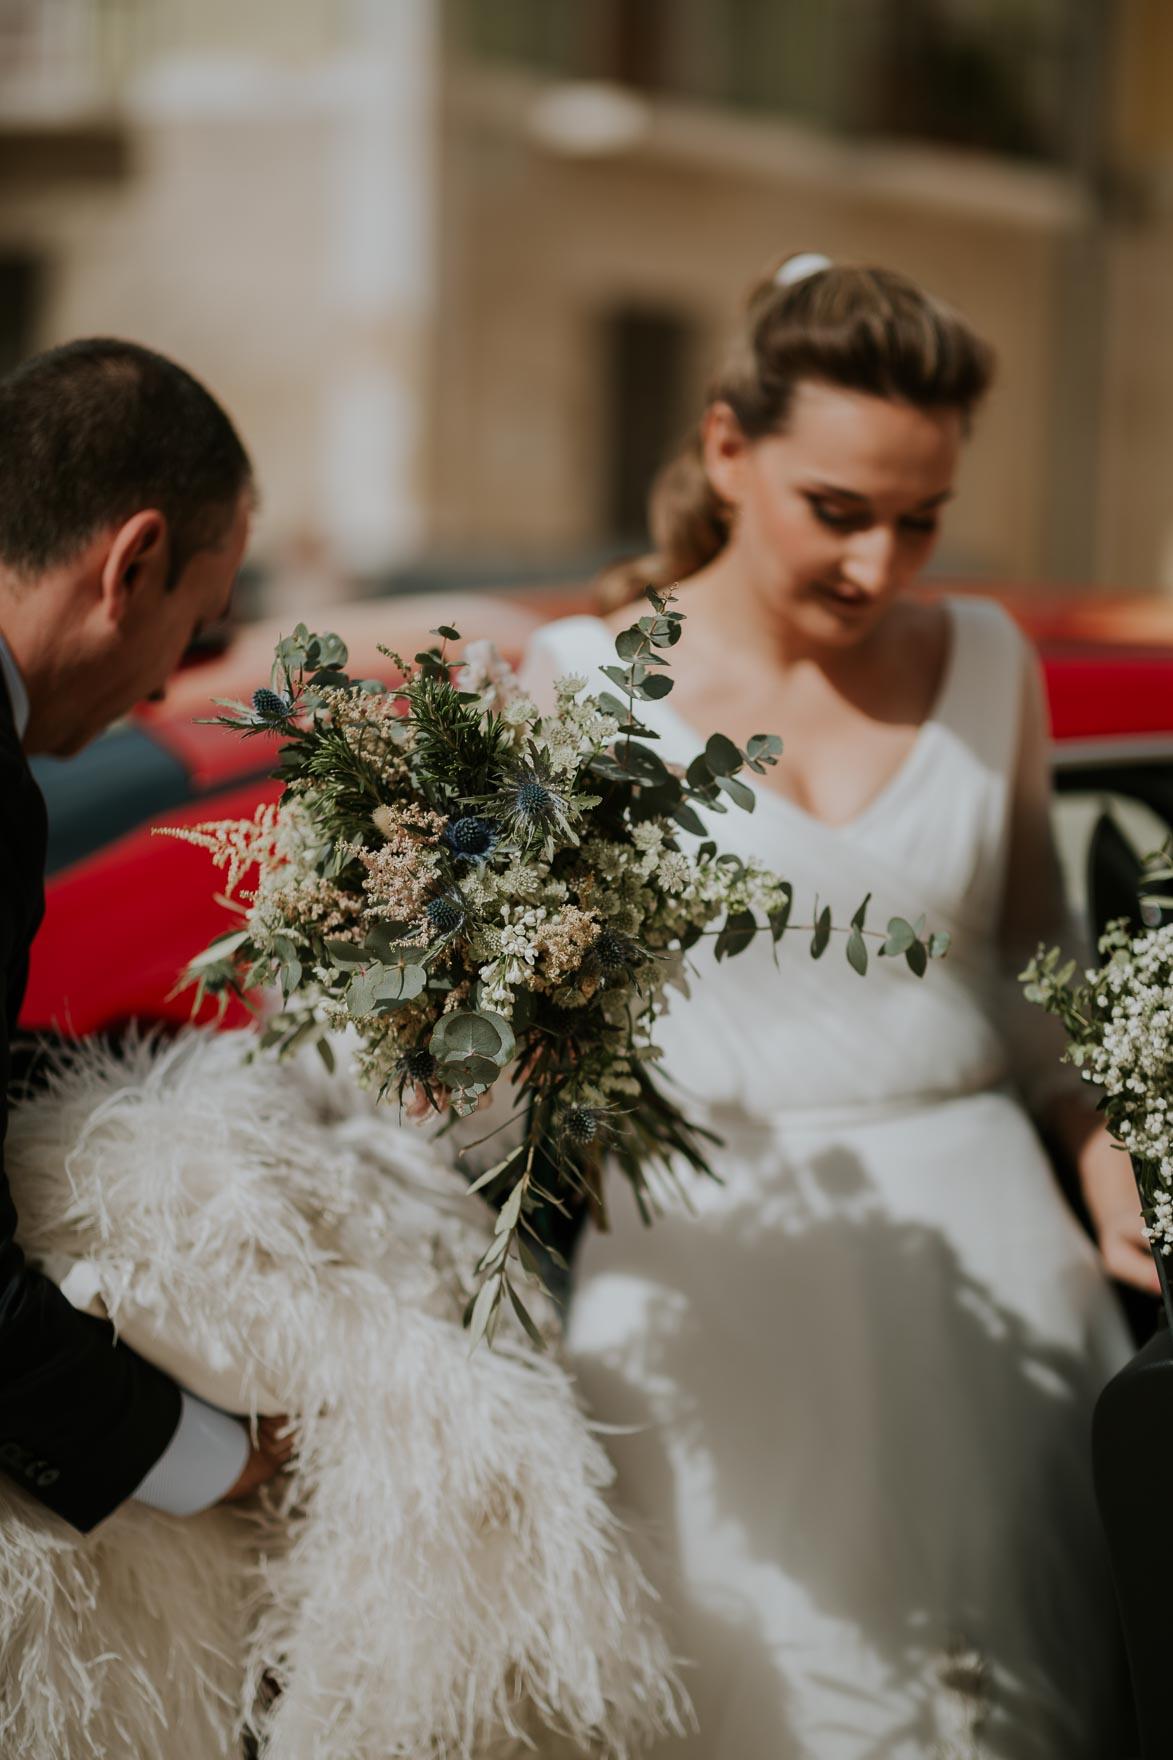 métodos de conservación de un ramo de novia